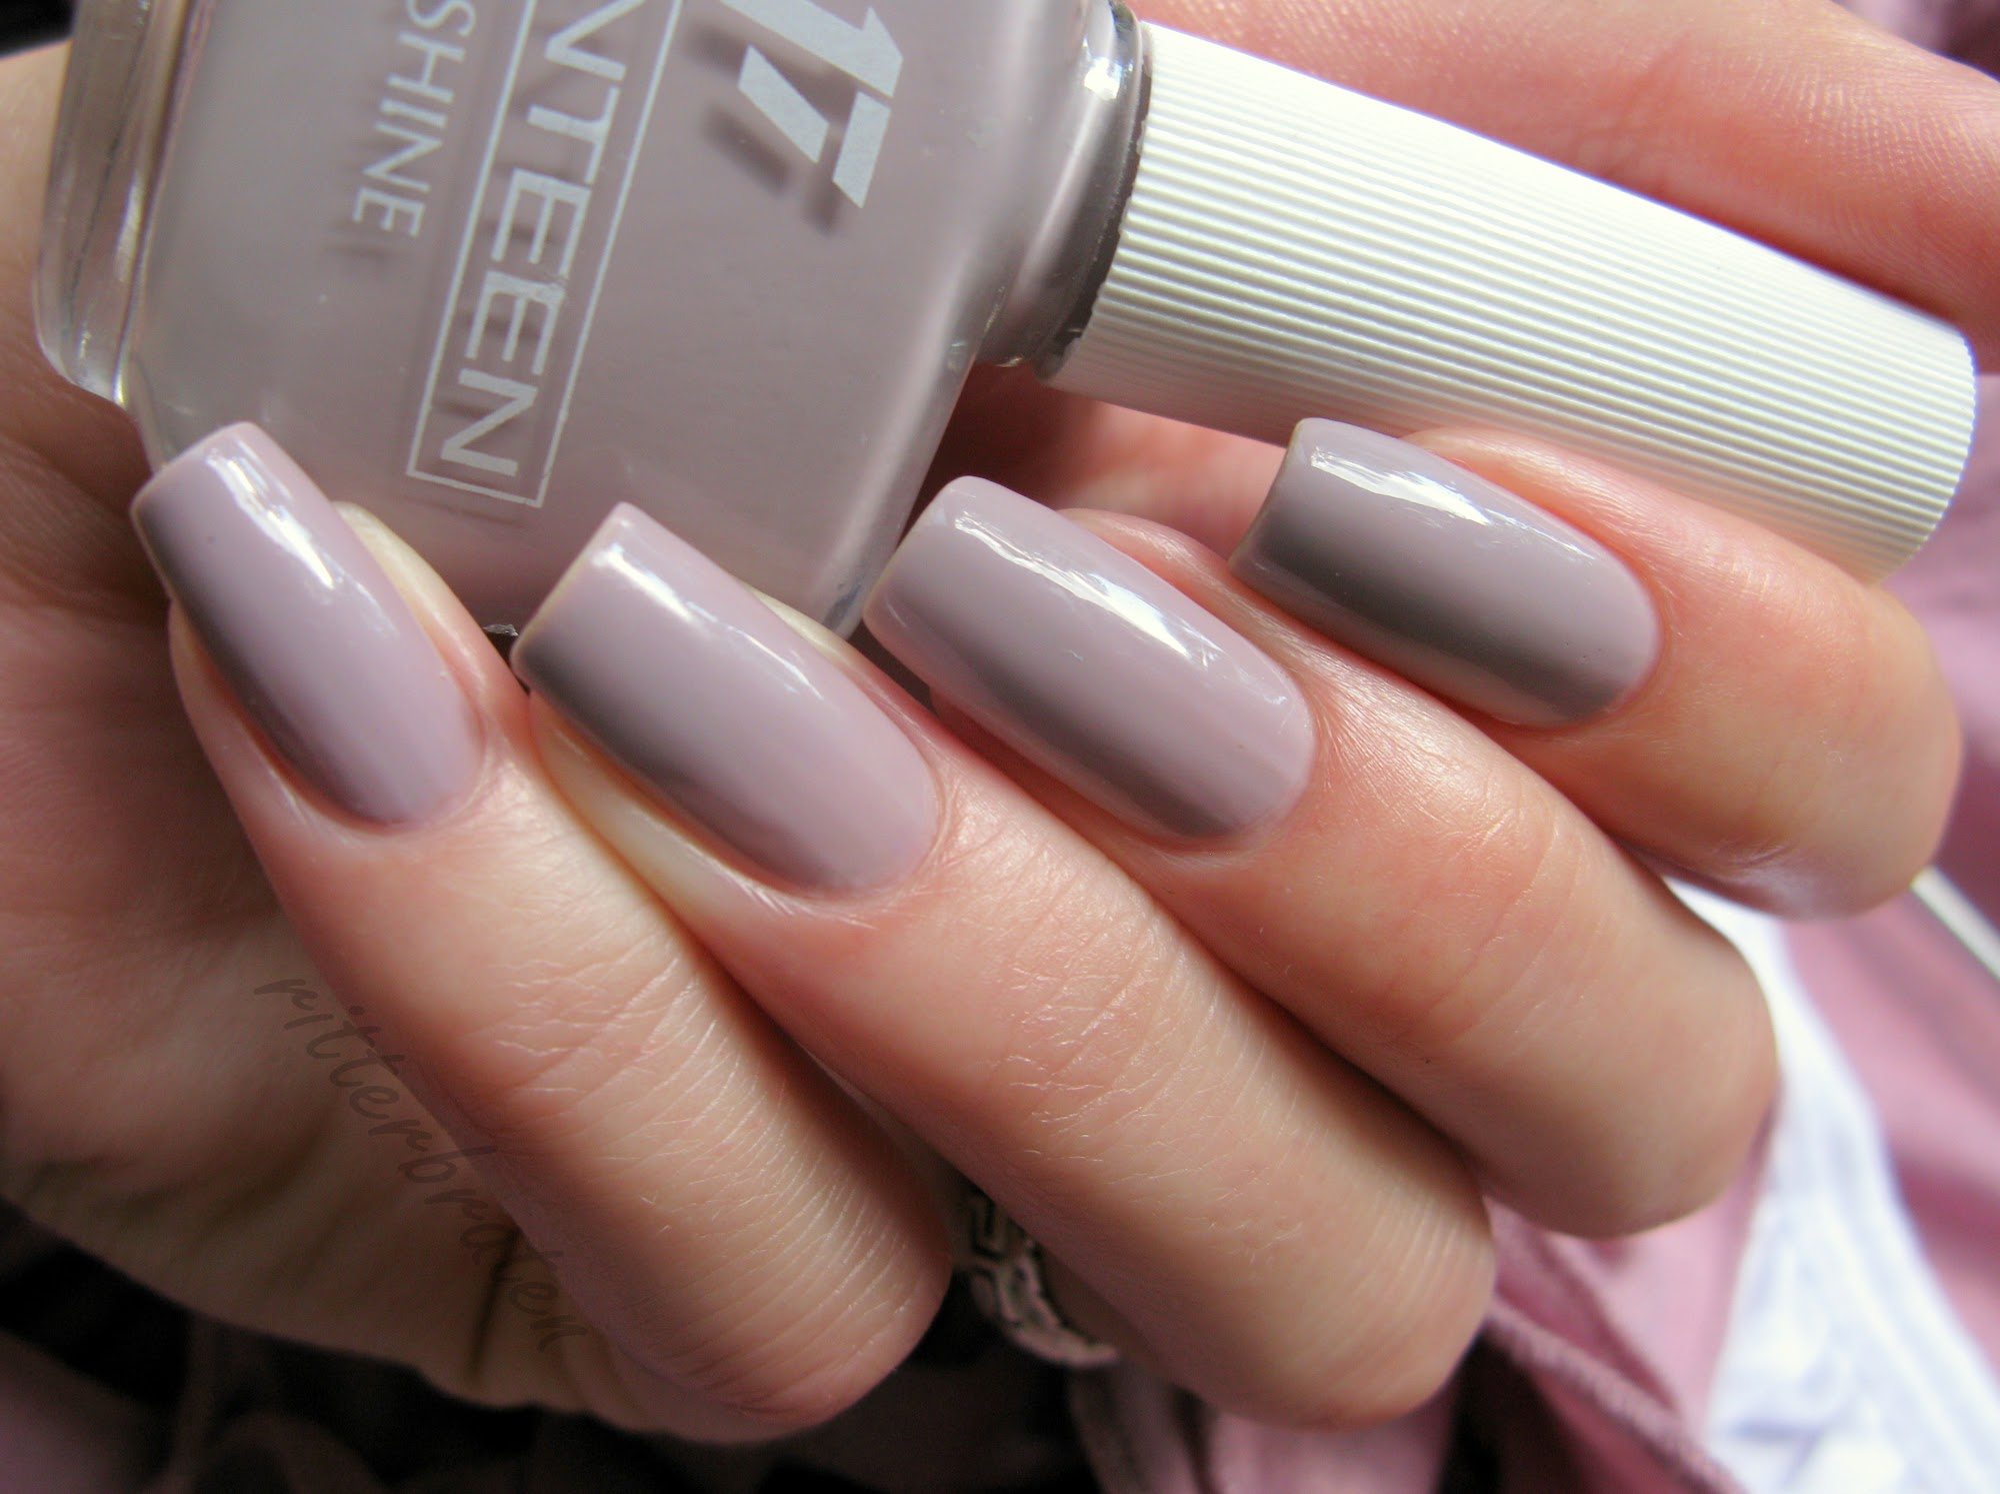 Seventeen 271 swatch nail polish